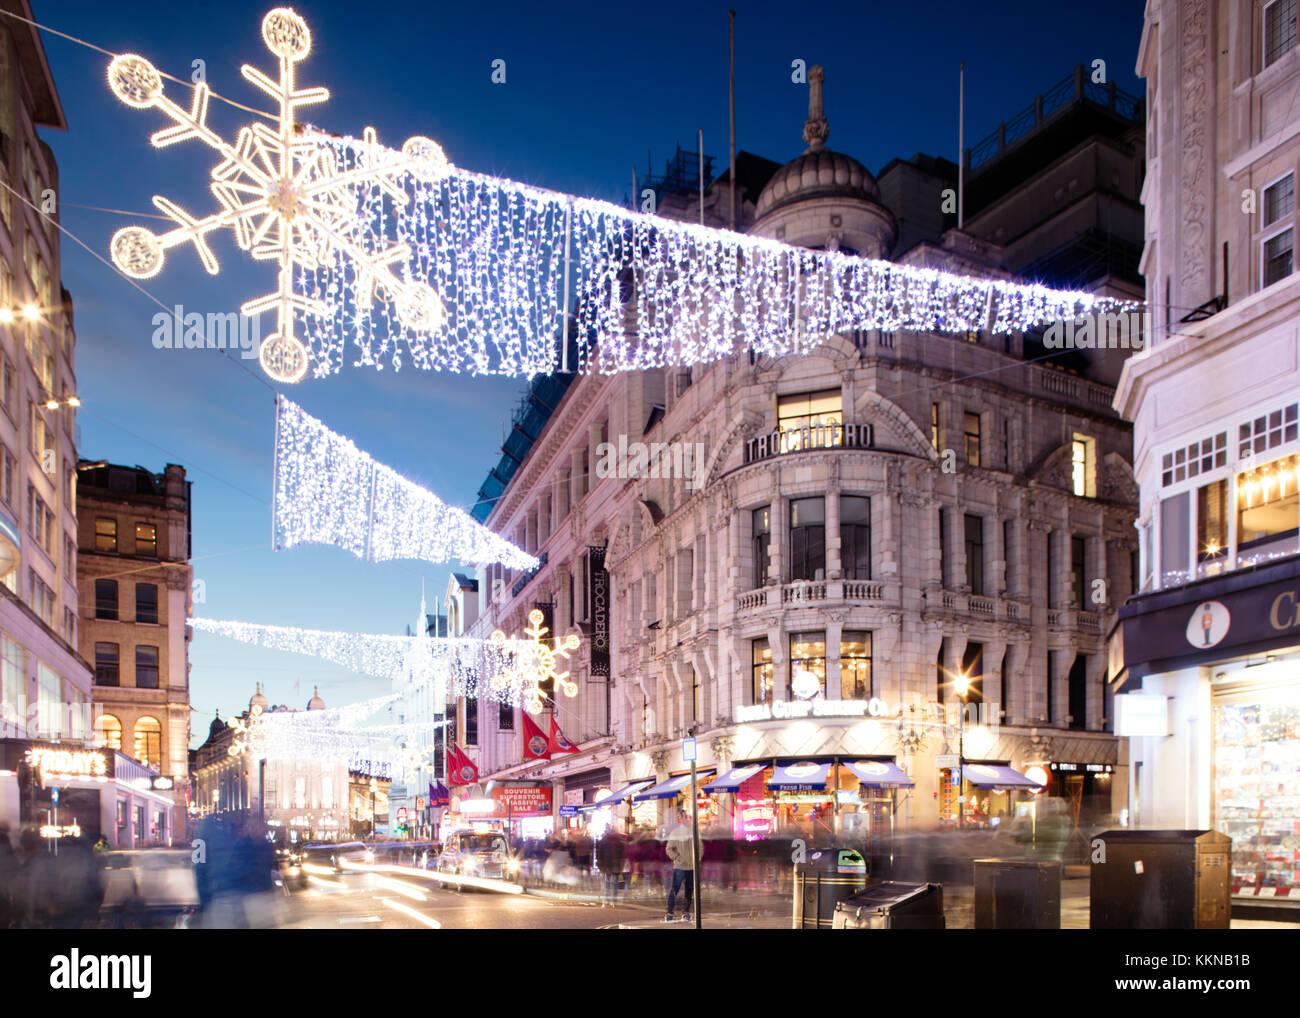 Inglaterra, Londres, las luces de Navidad en Piccadilly Circus y Regent Street Imagen De Stock